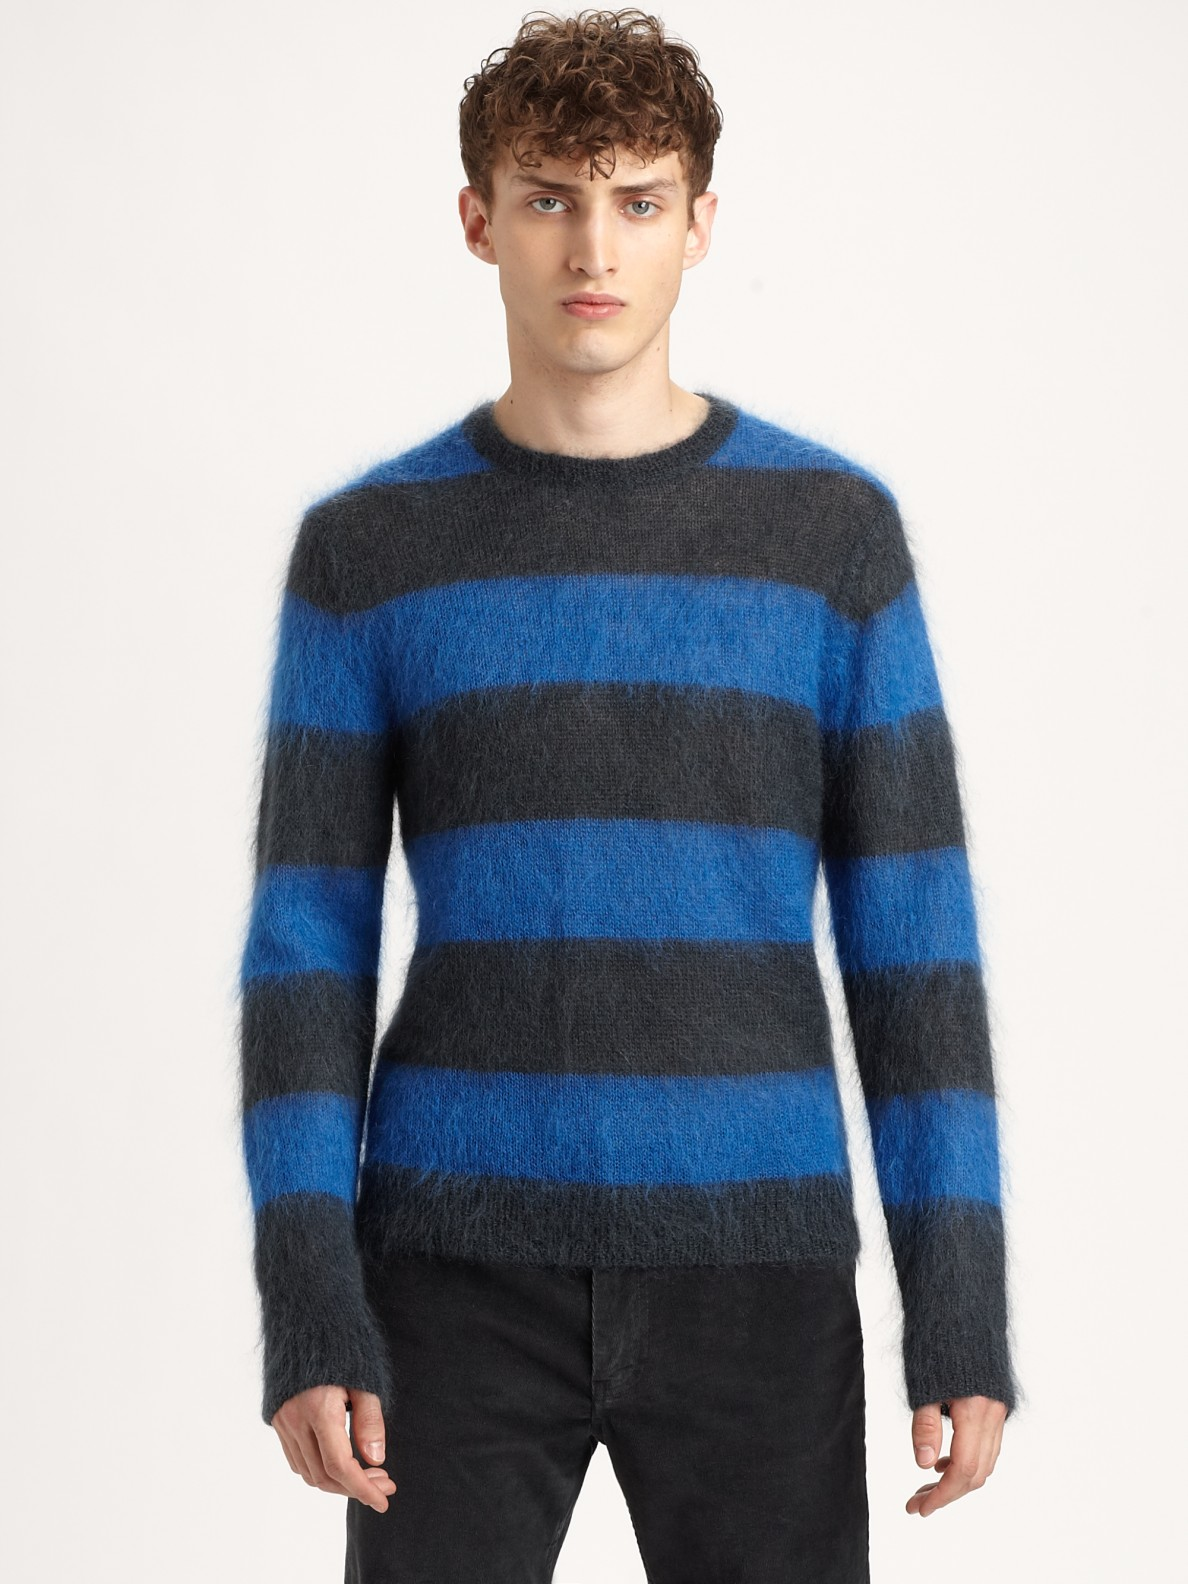 marc by marc jacobs stripe crewneck sweater in blue for men lyst. Black Bedroom Furniture Sets. Home Design Ideas